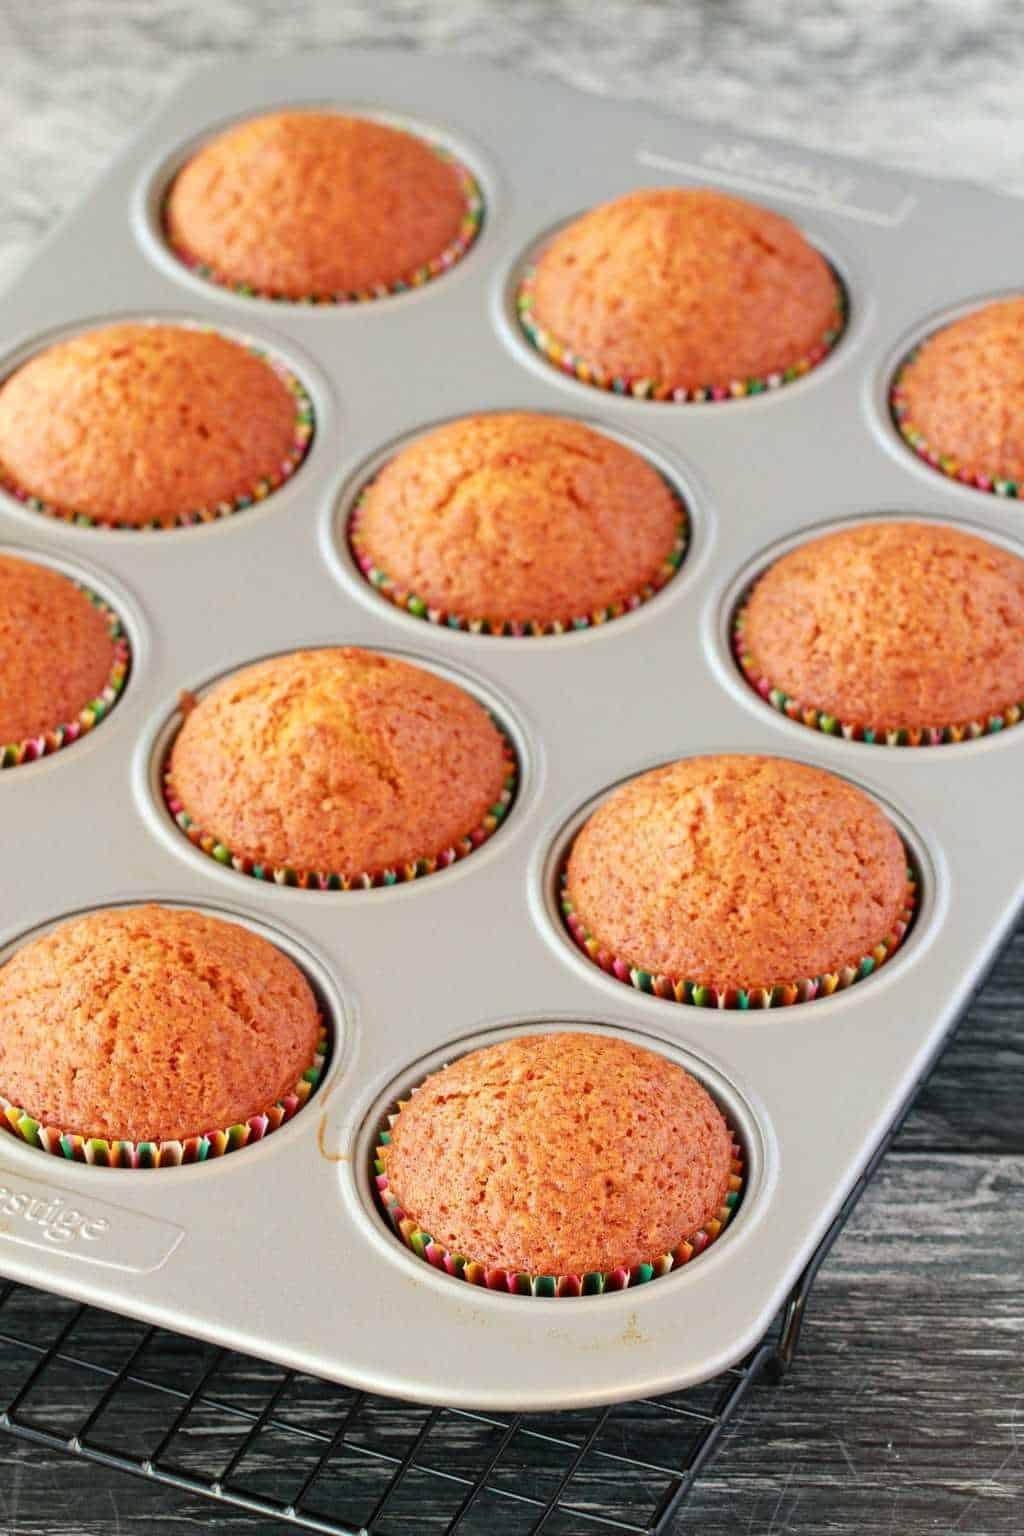 Making Vegan Peppermint Cupcakes #vegan #lovingitvegan #cupcakes #dessert